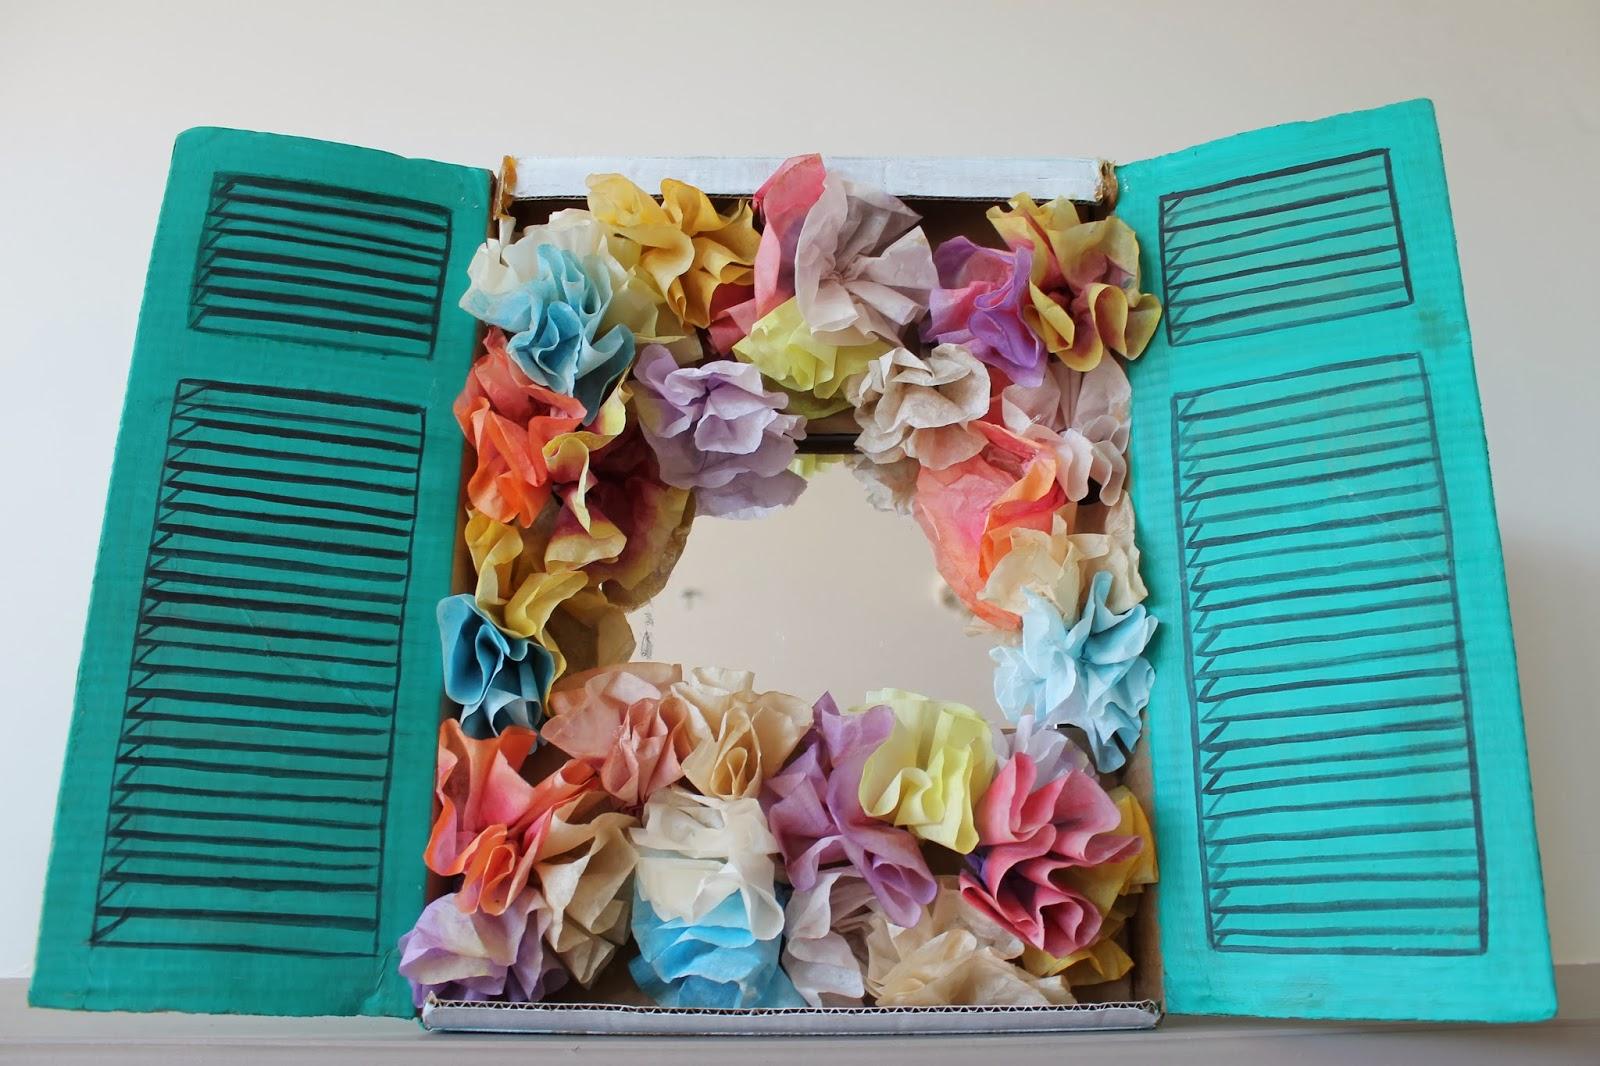 Wellesley Community Art Project: New \